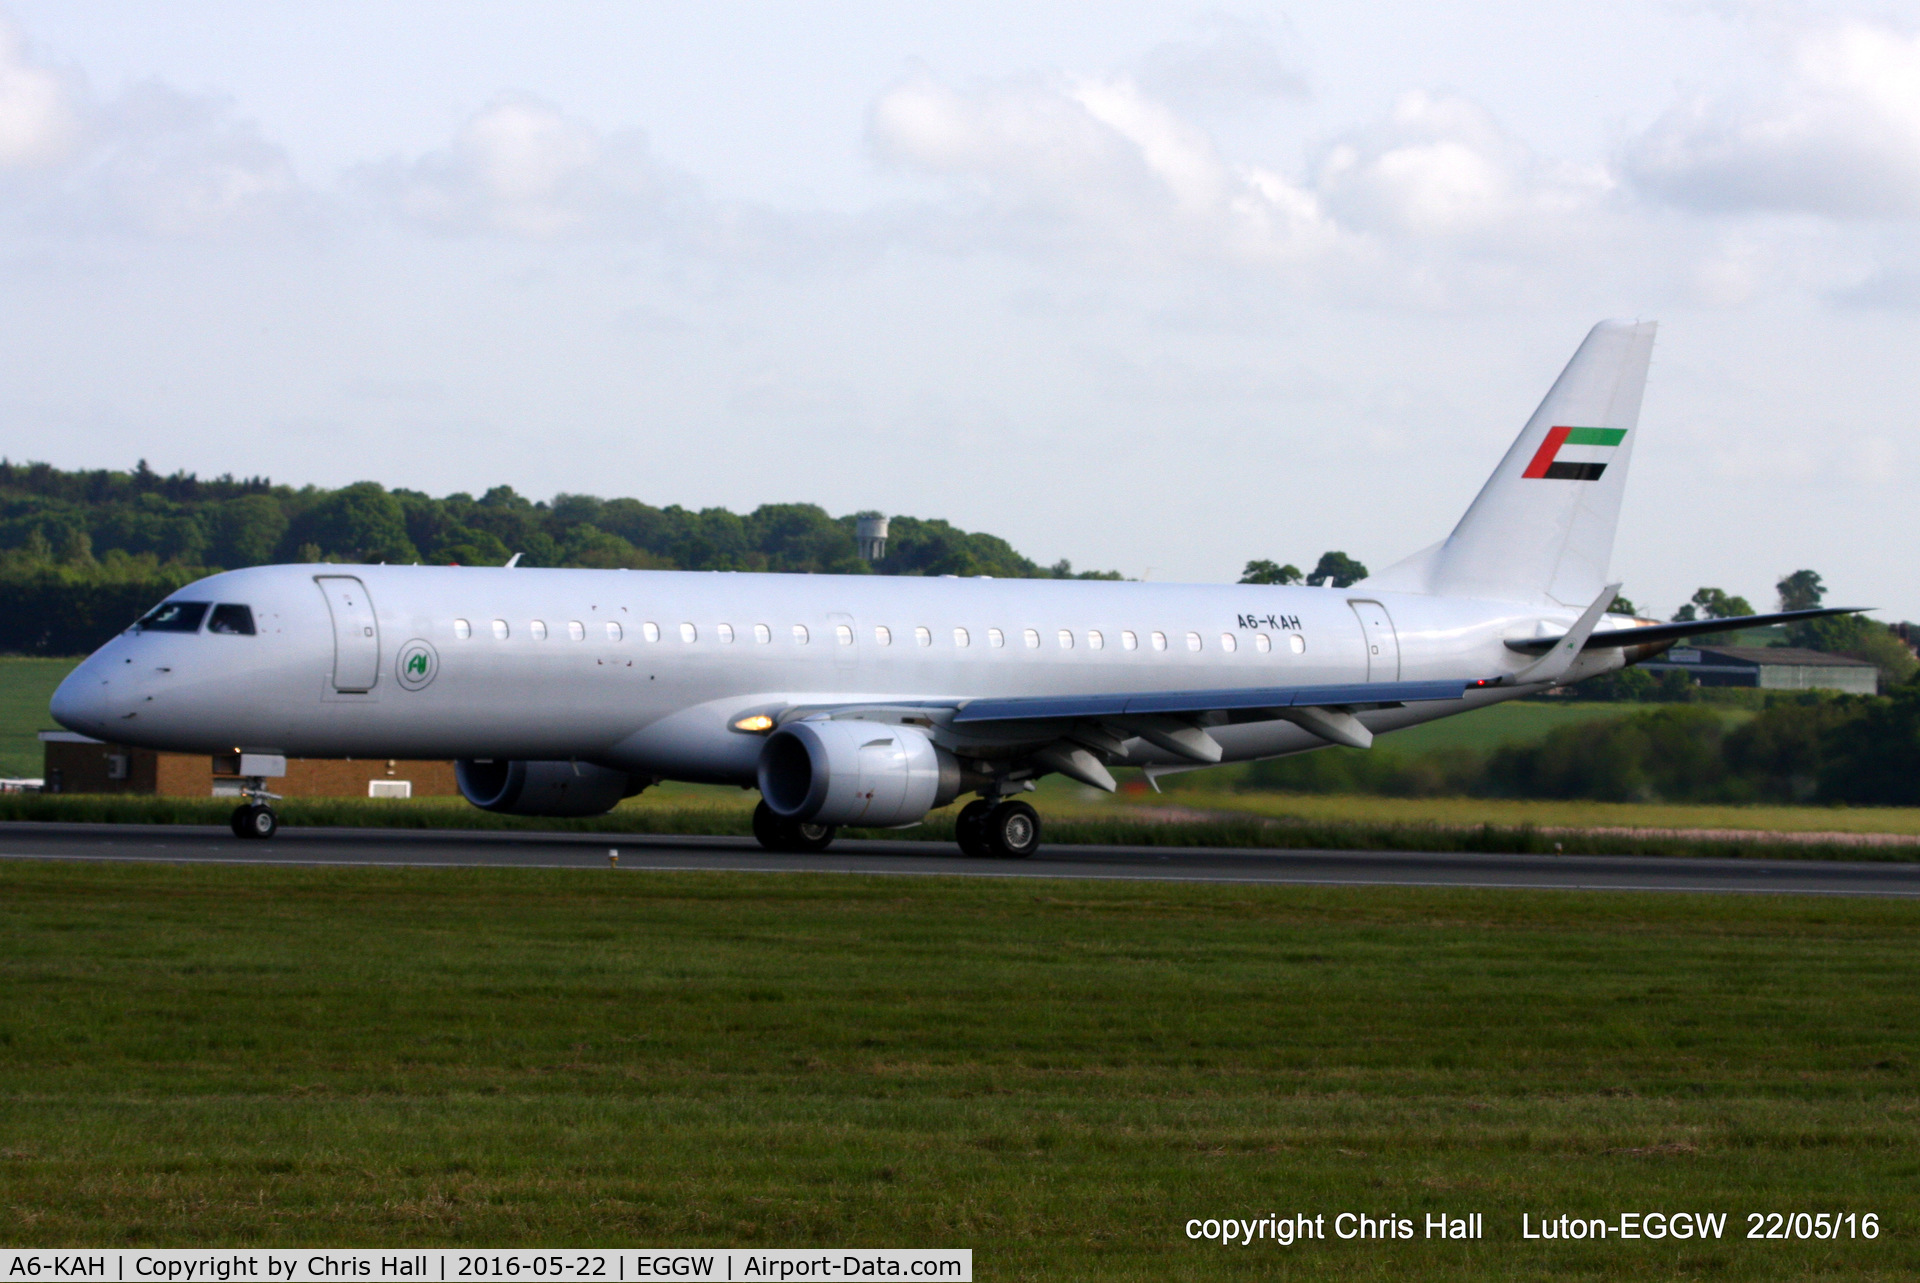 A6-KAH, 2010 Embraer ERJ-190-100ECJ Lineage 1000 C/N 19000236, Royal Jet